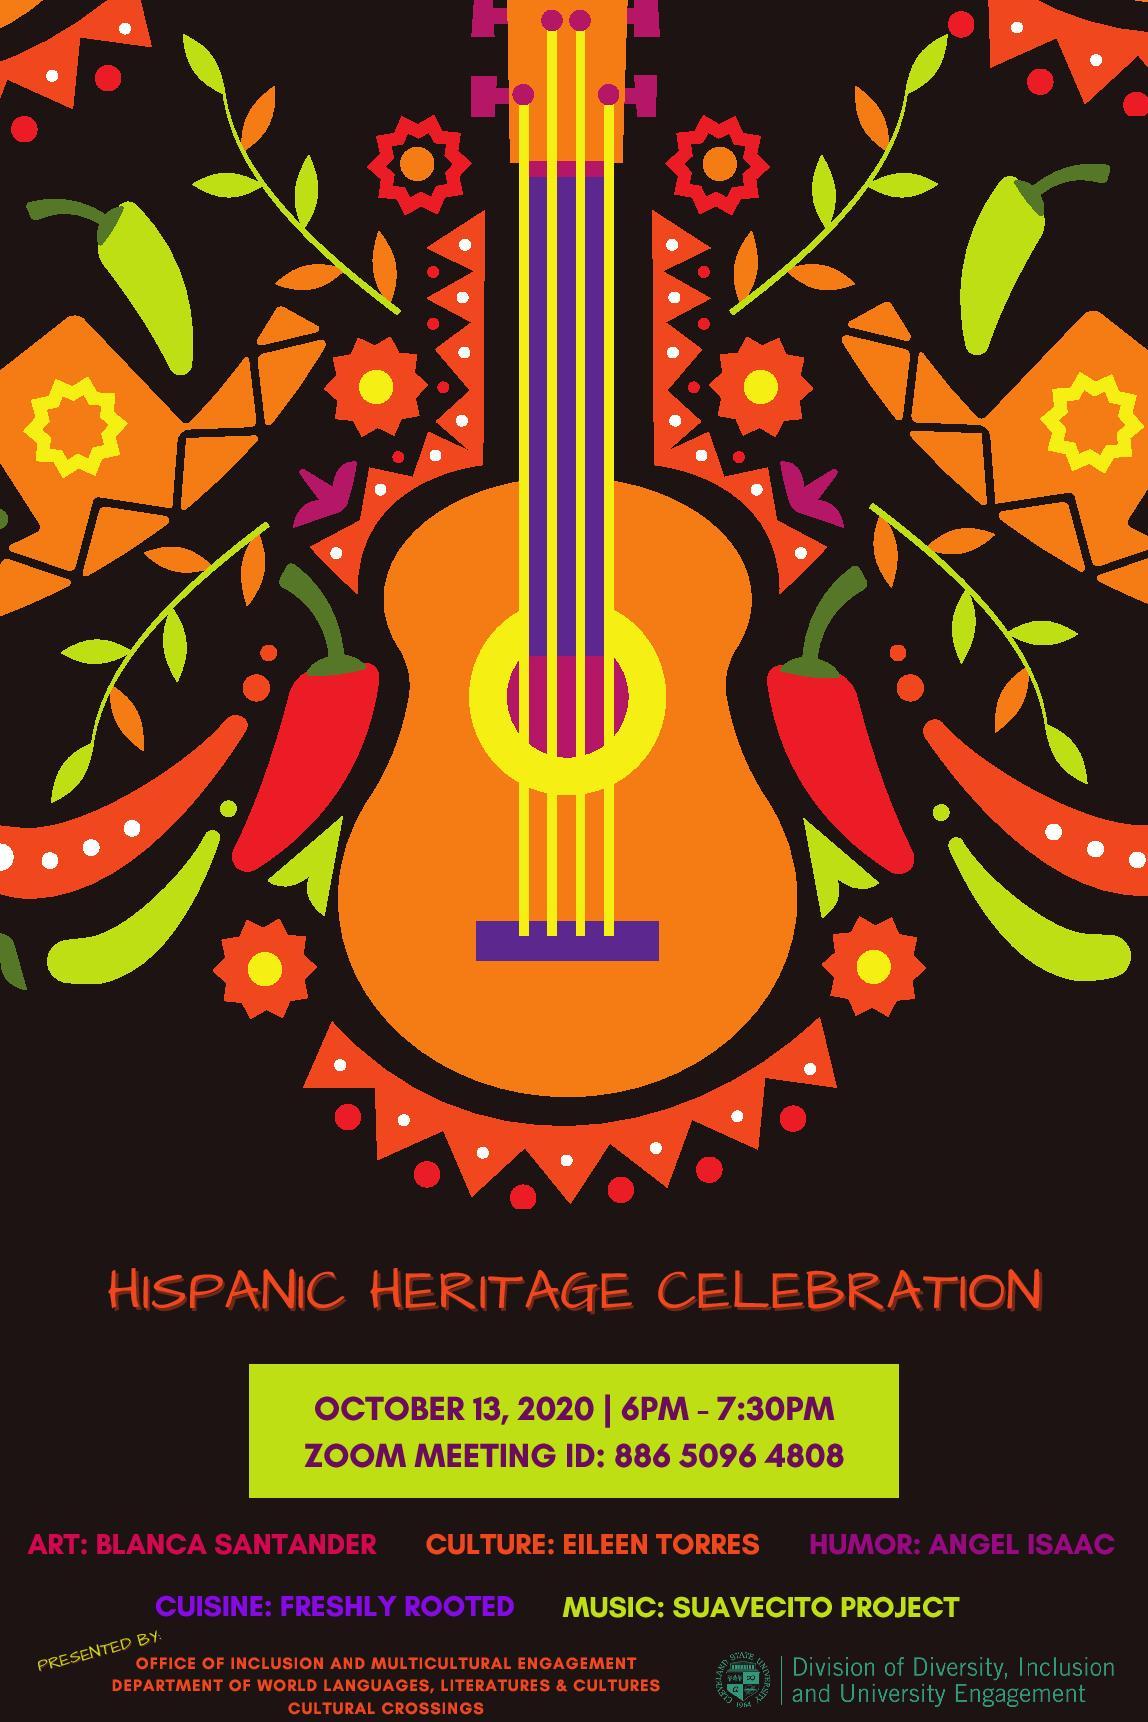 Hispanic Heritage 2020